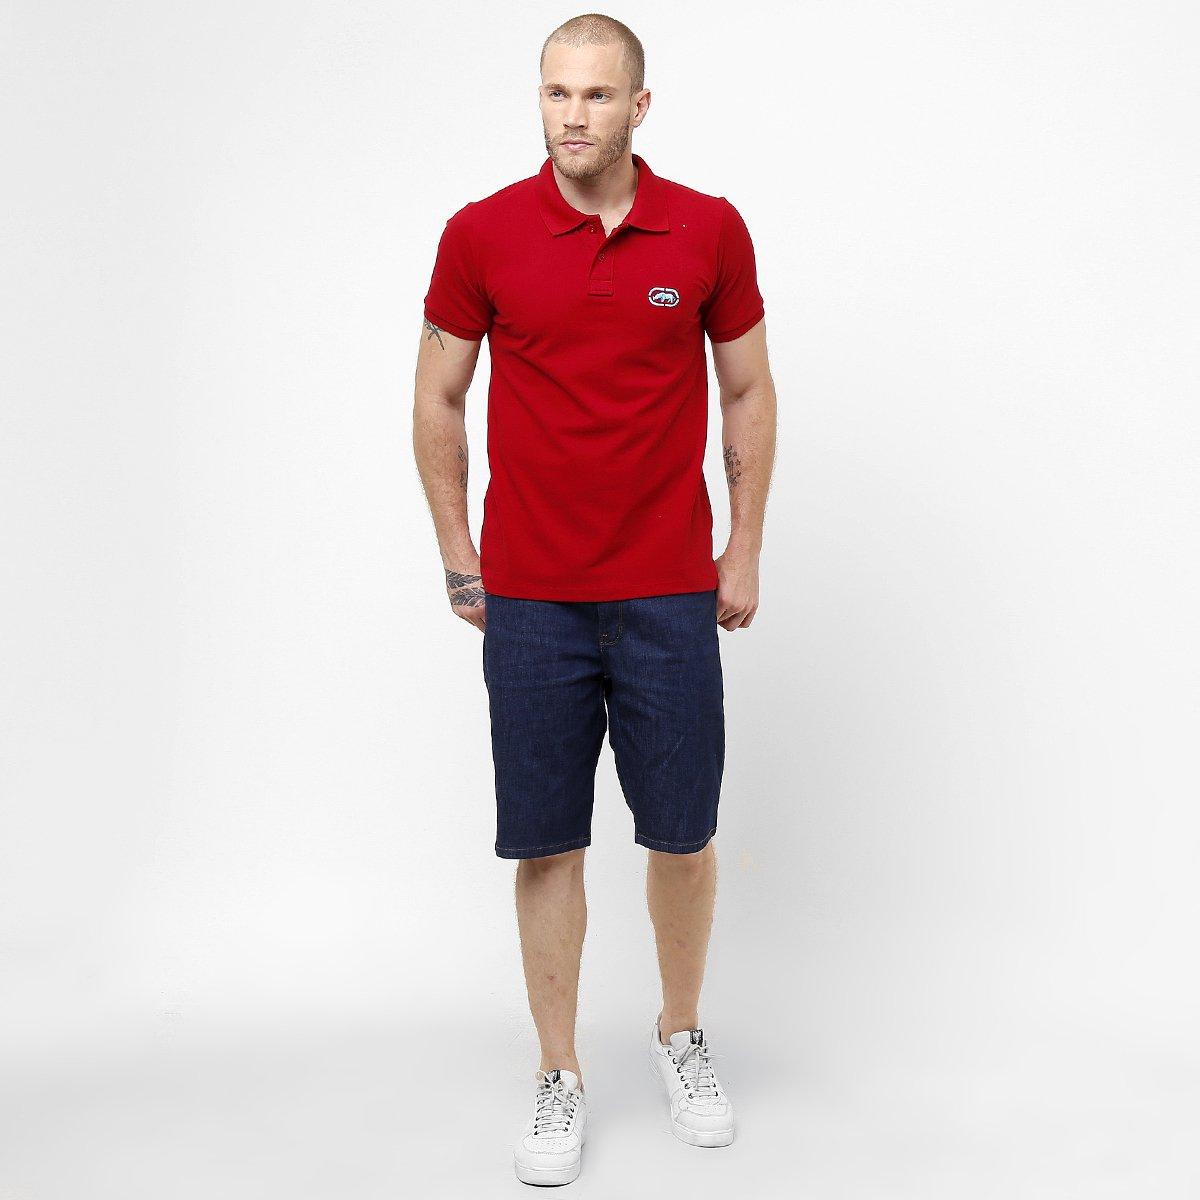 Camisa Polo Ecko Piquet Básica - Compre Agora  f30f0cd44cea4